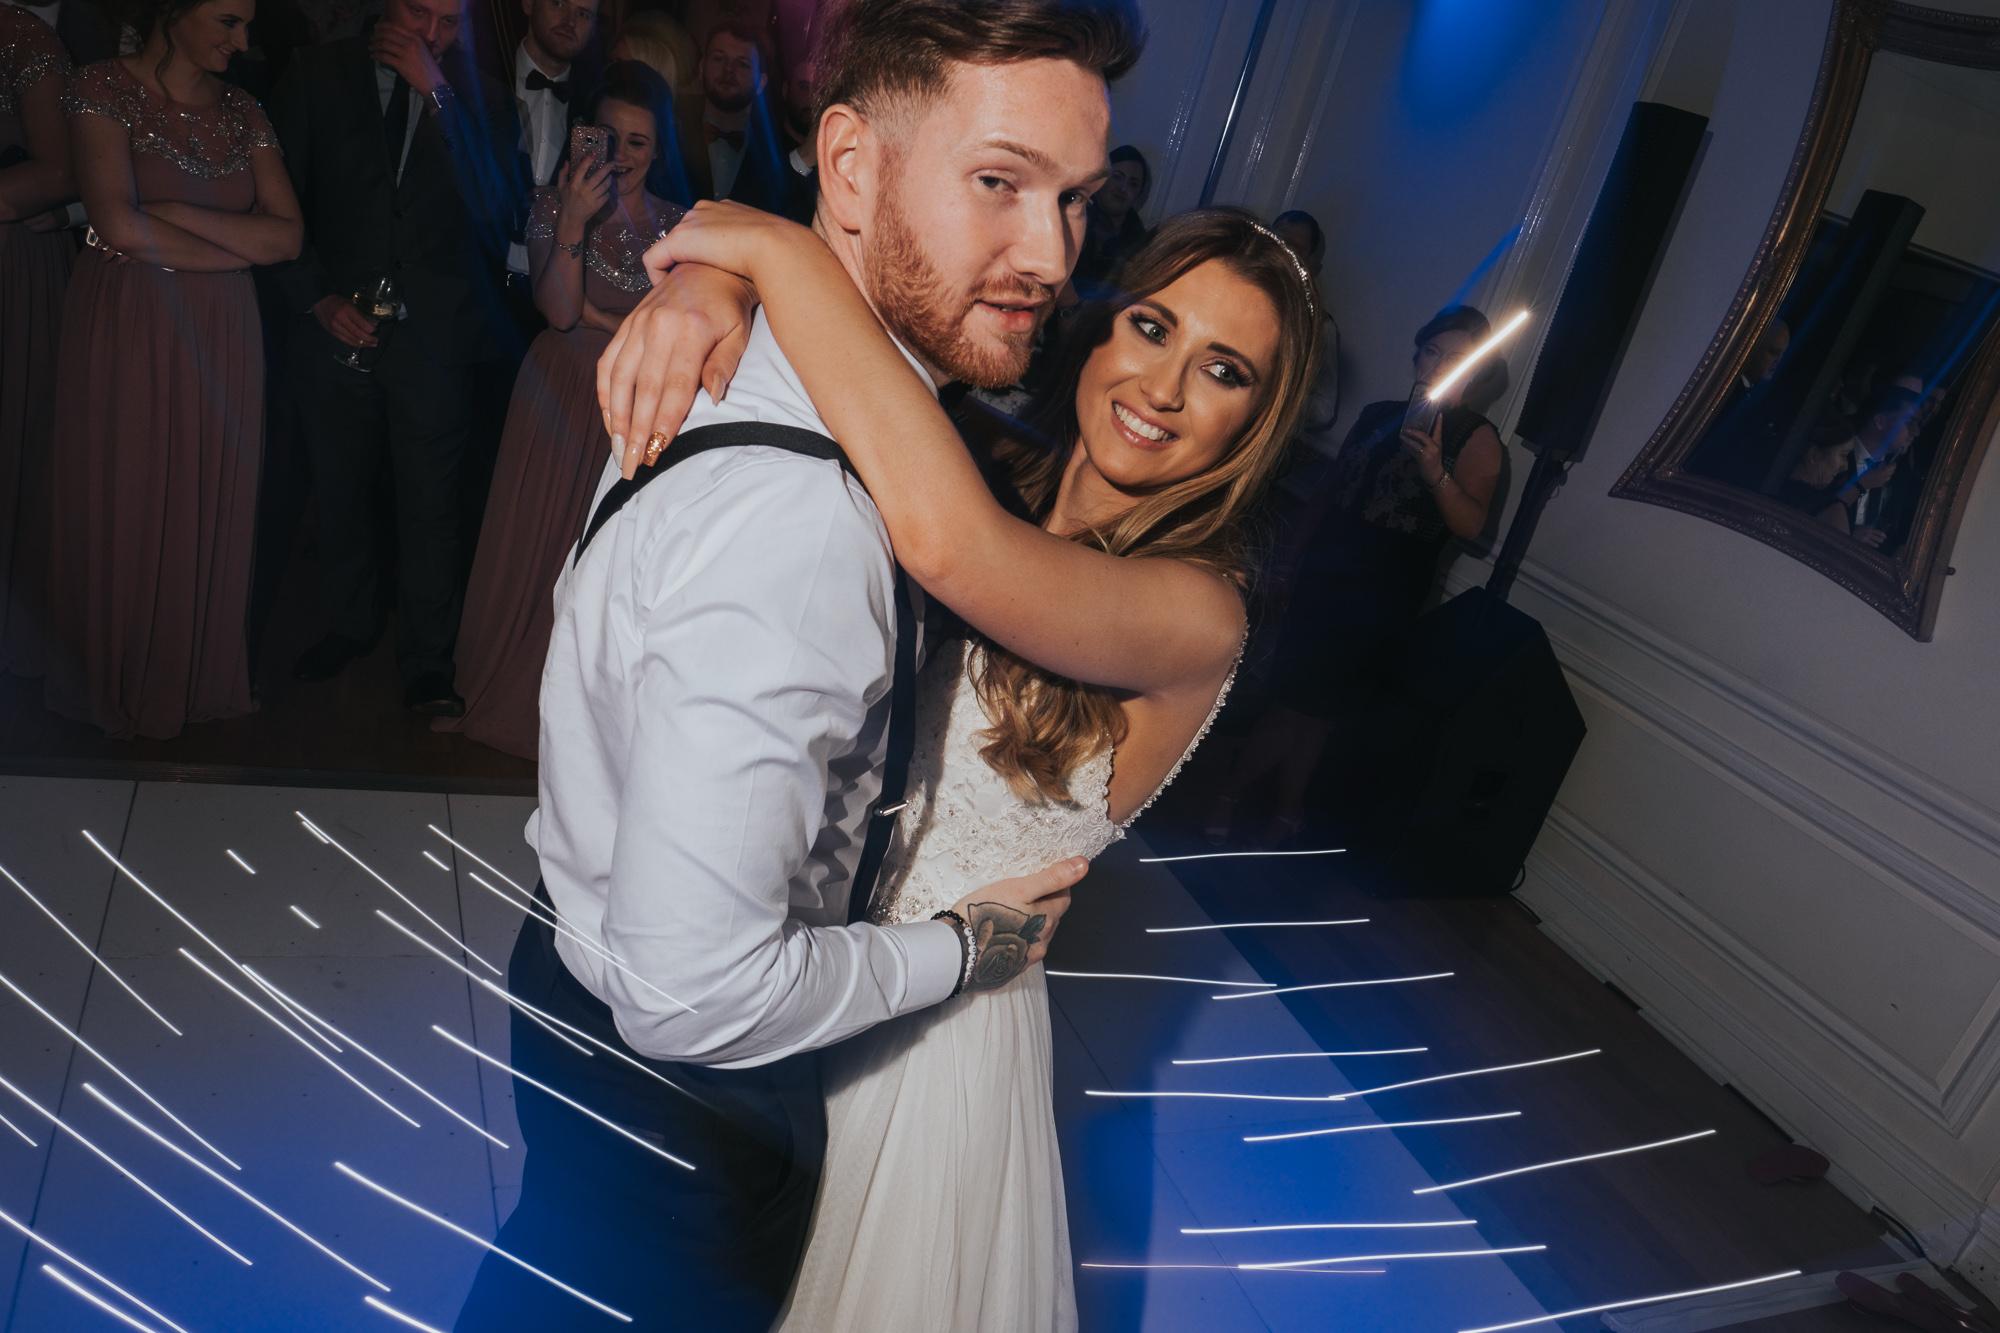 West Tower Exclusive Wedding Venue wedding photography merseyside and lancashire wedding photographer (57 of 60).jpg